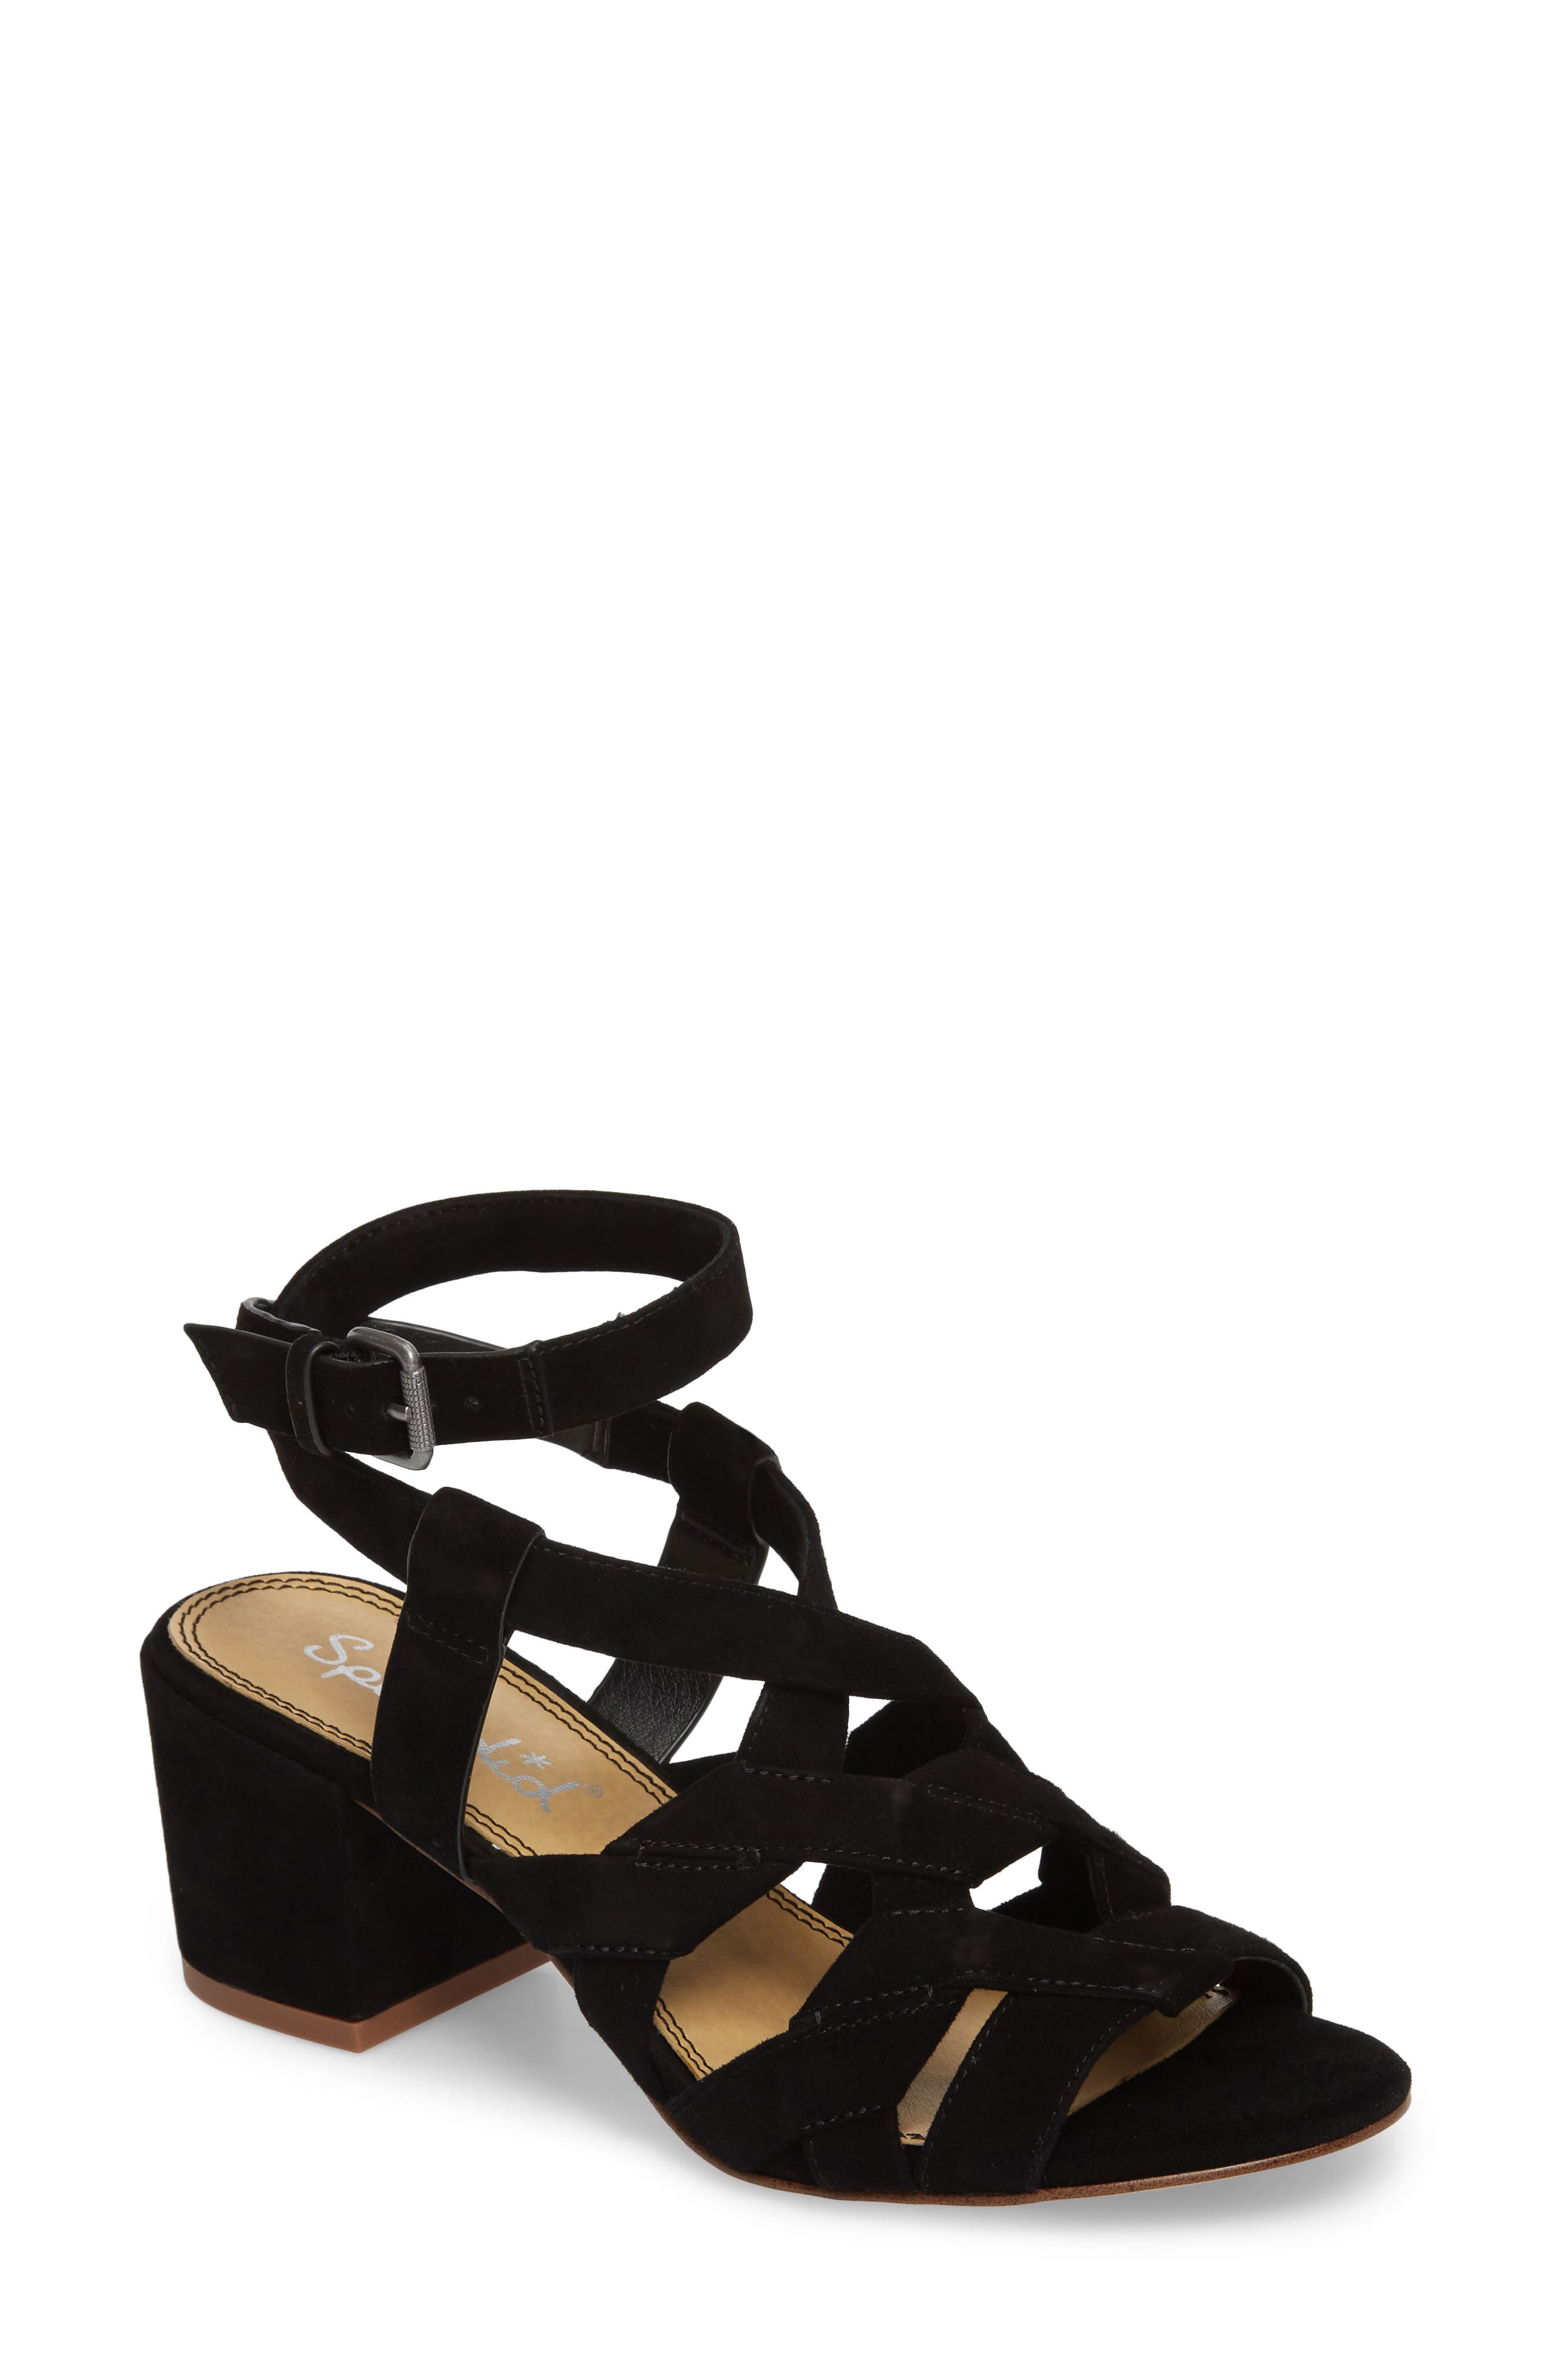 Barrymore Sandal,                         Main,                         color,